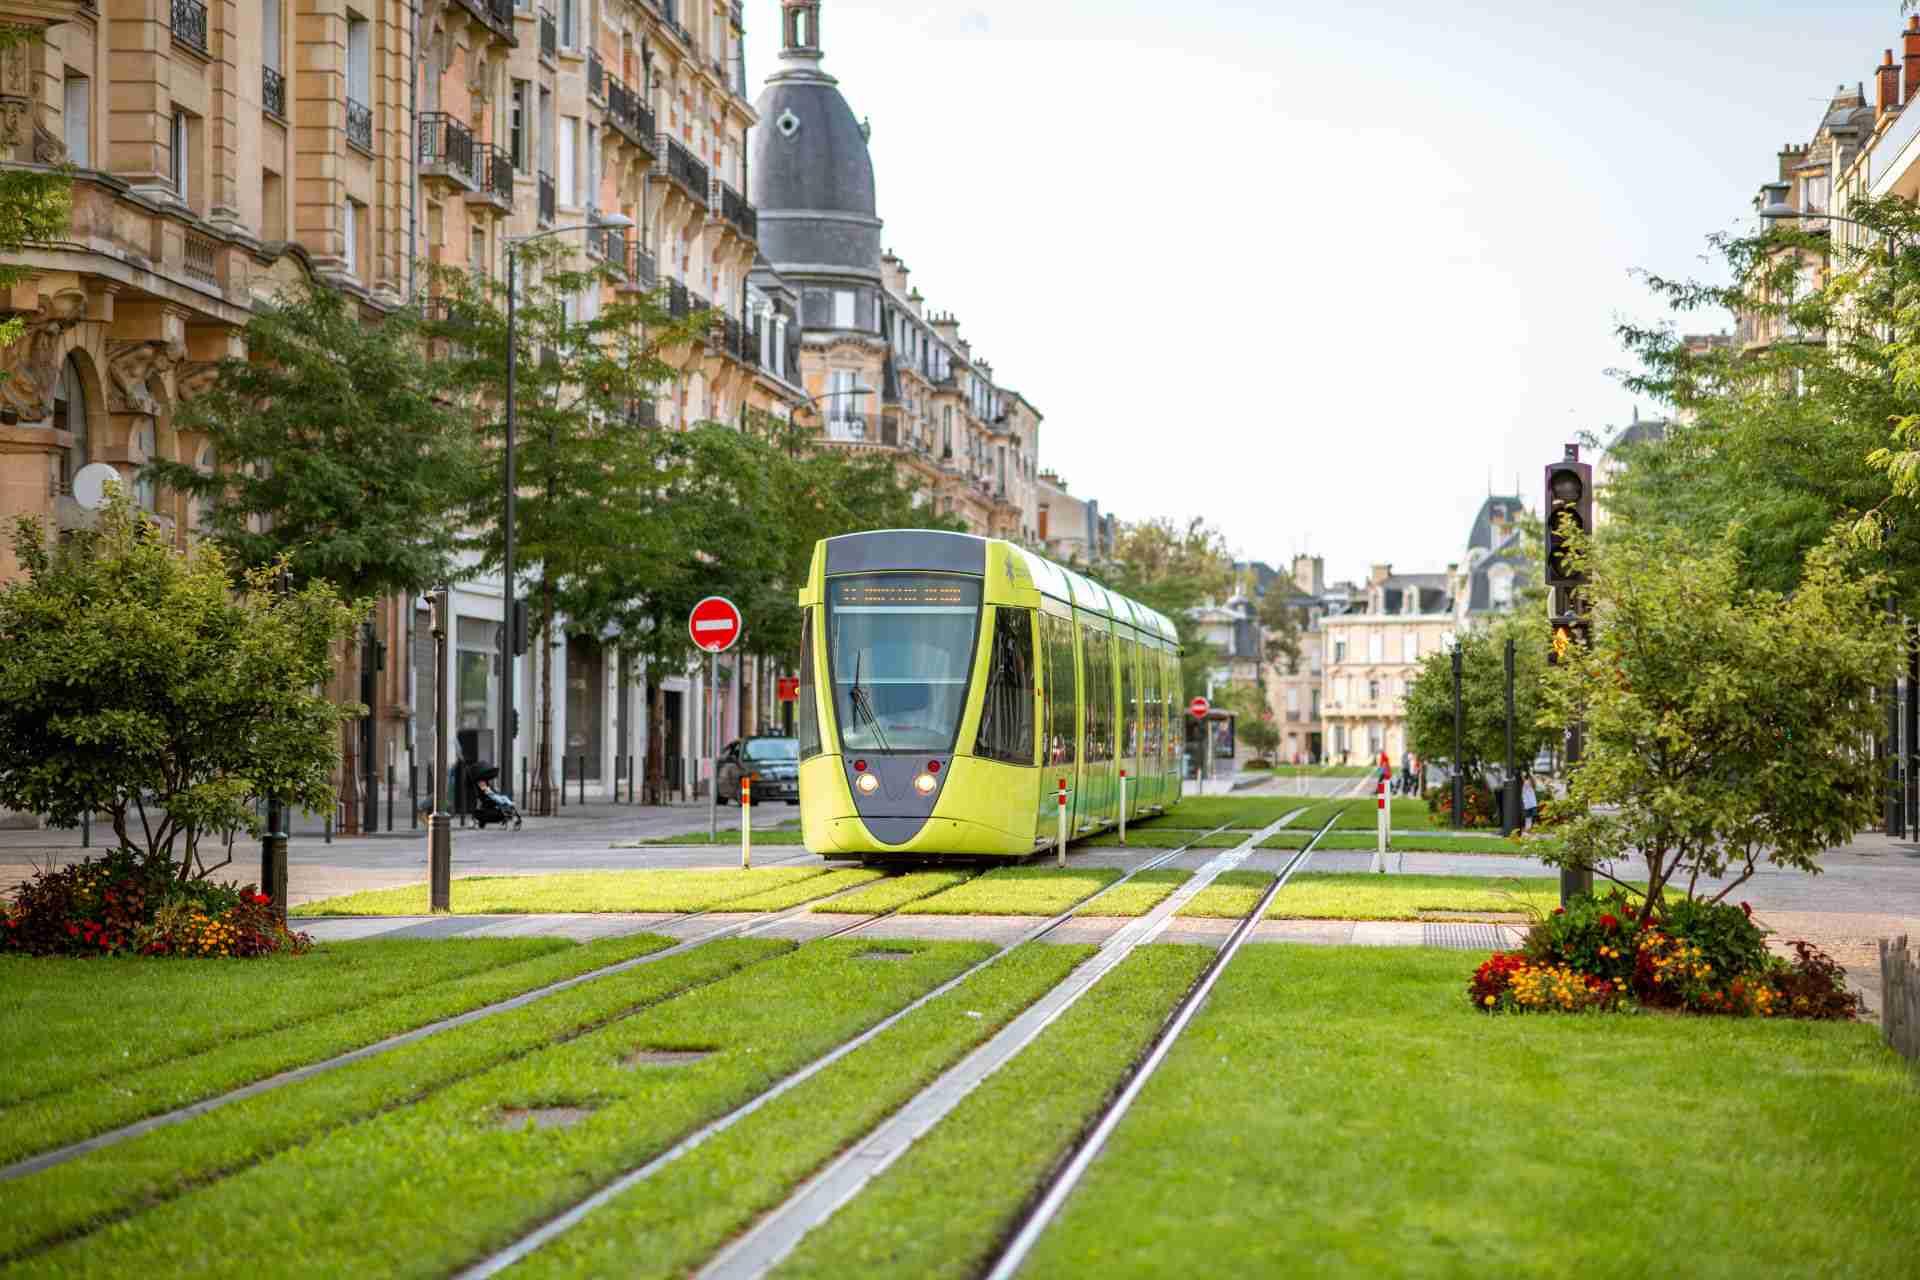 Reims Tram